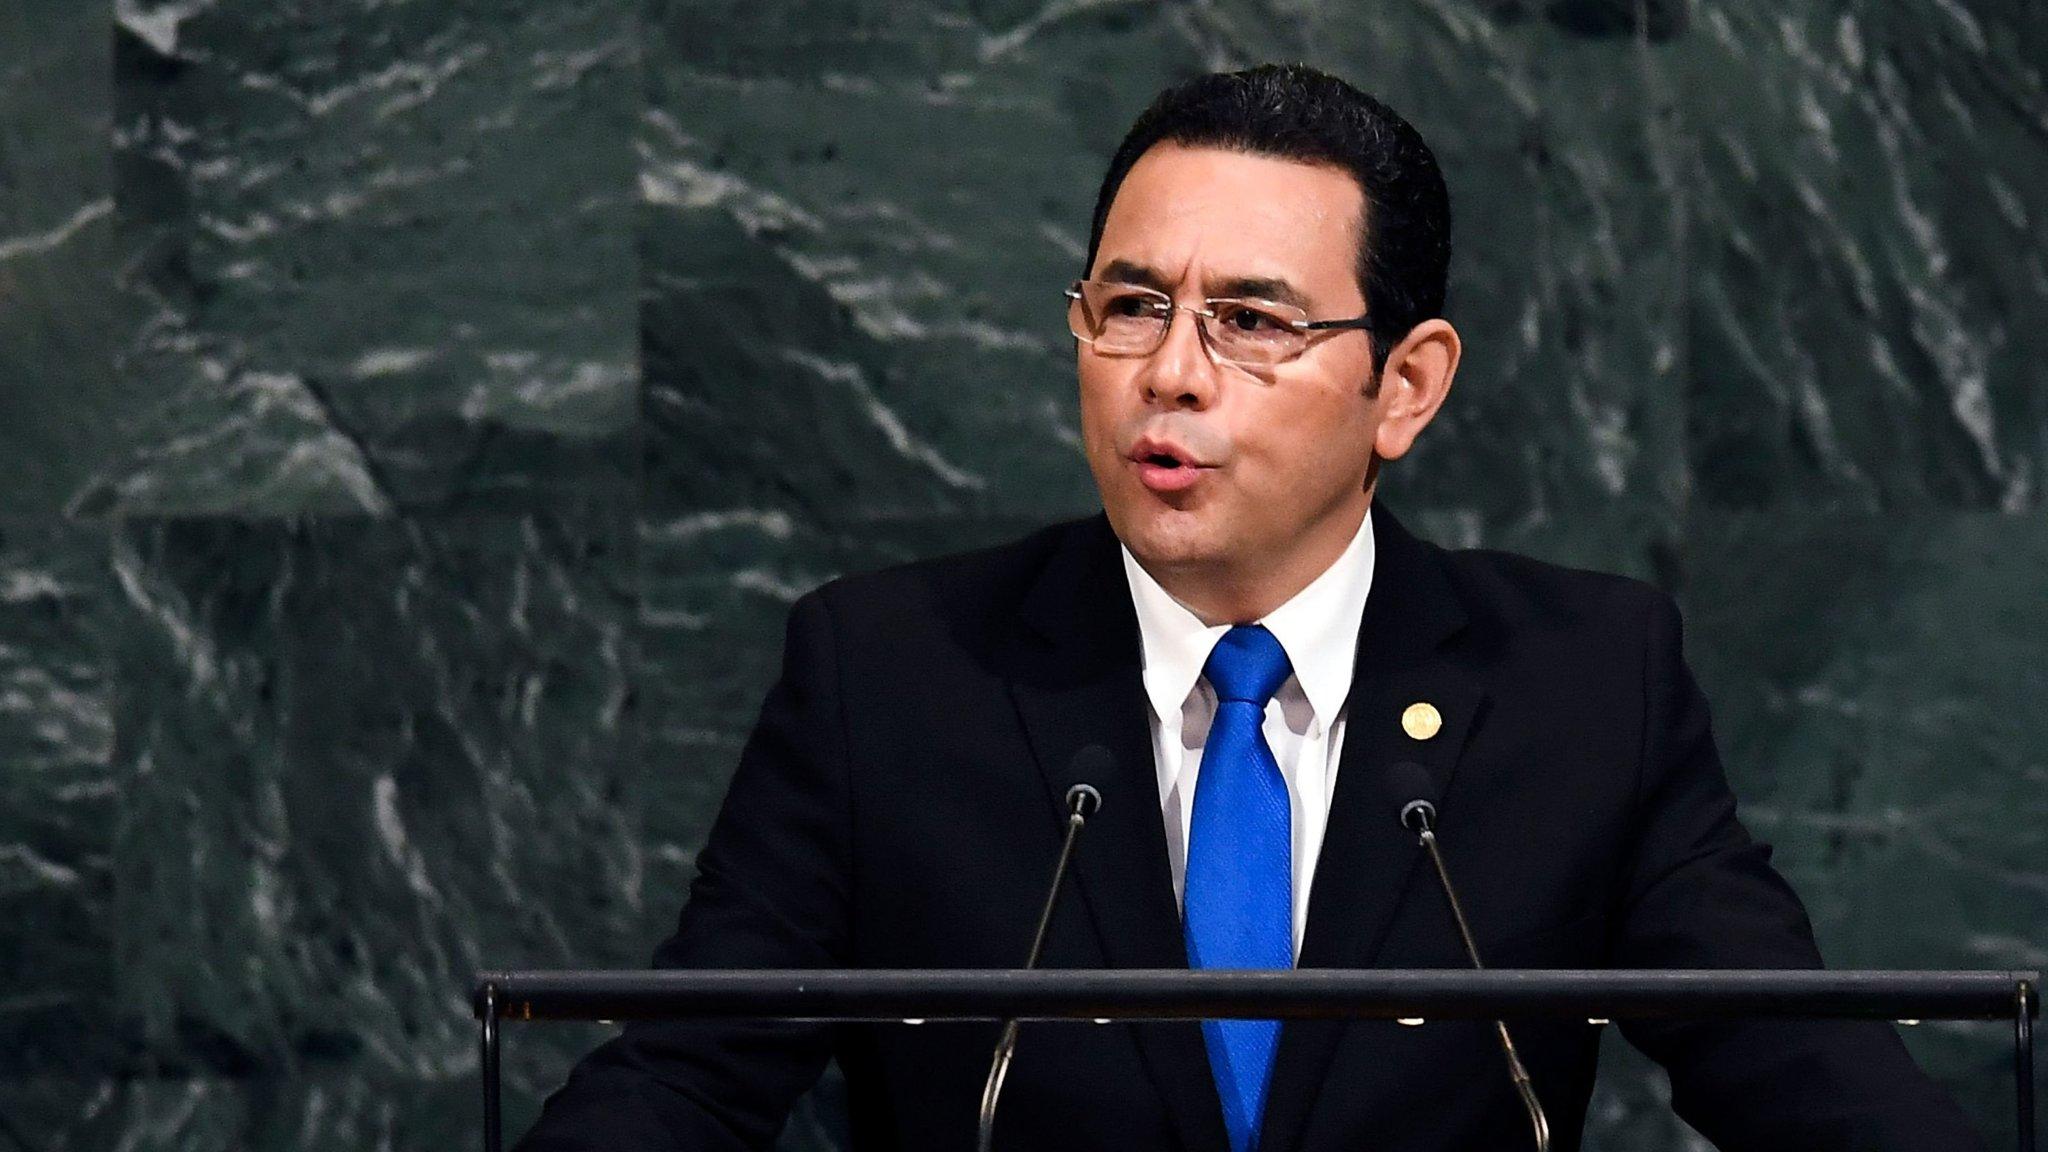 Guatemala joins US with Jerusalem embassy move